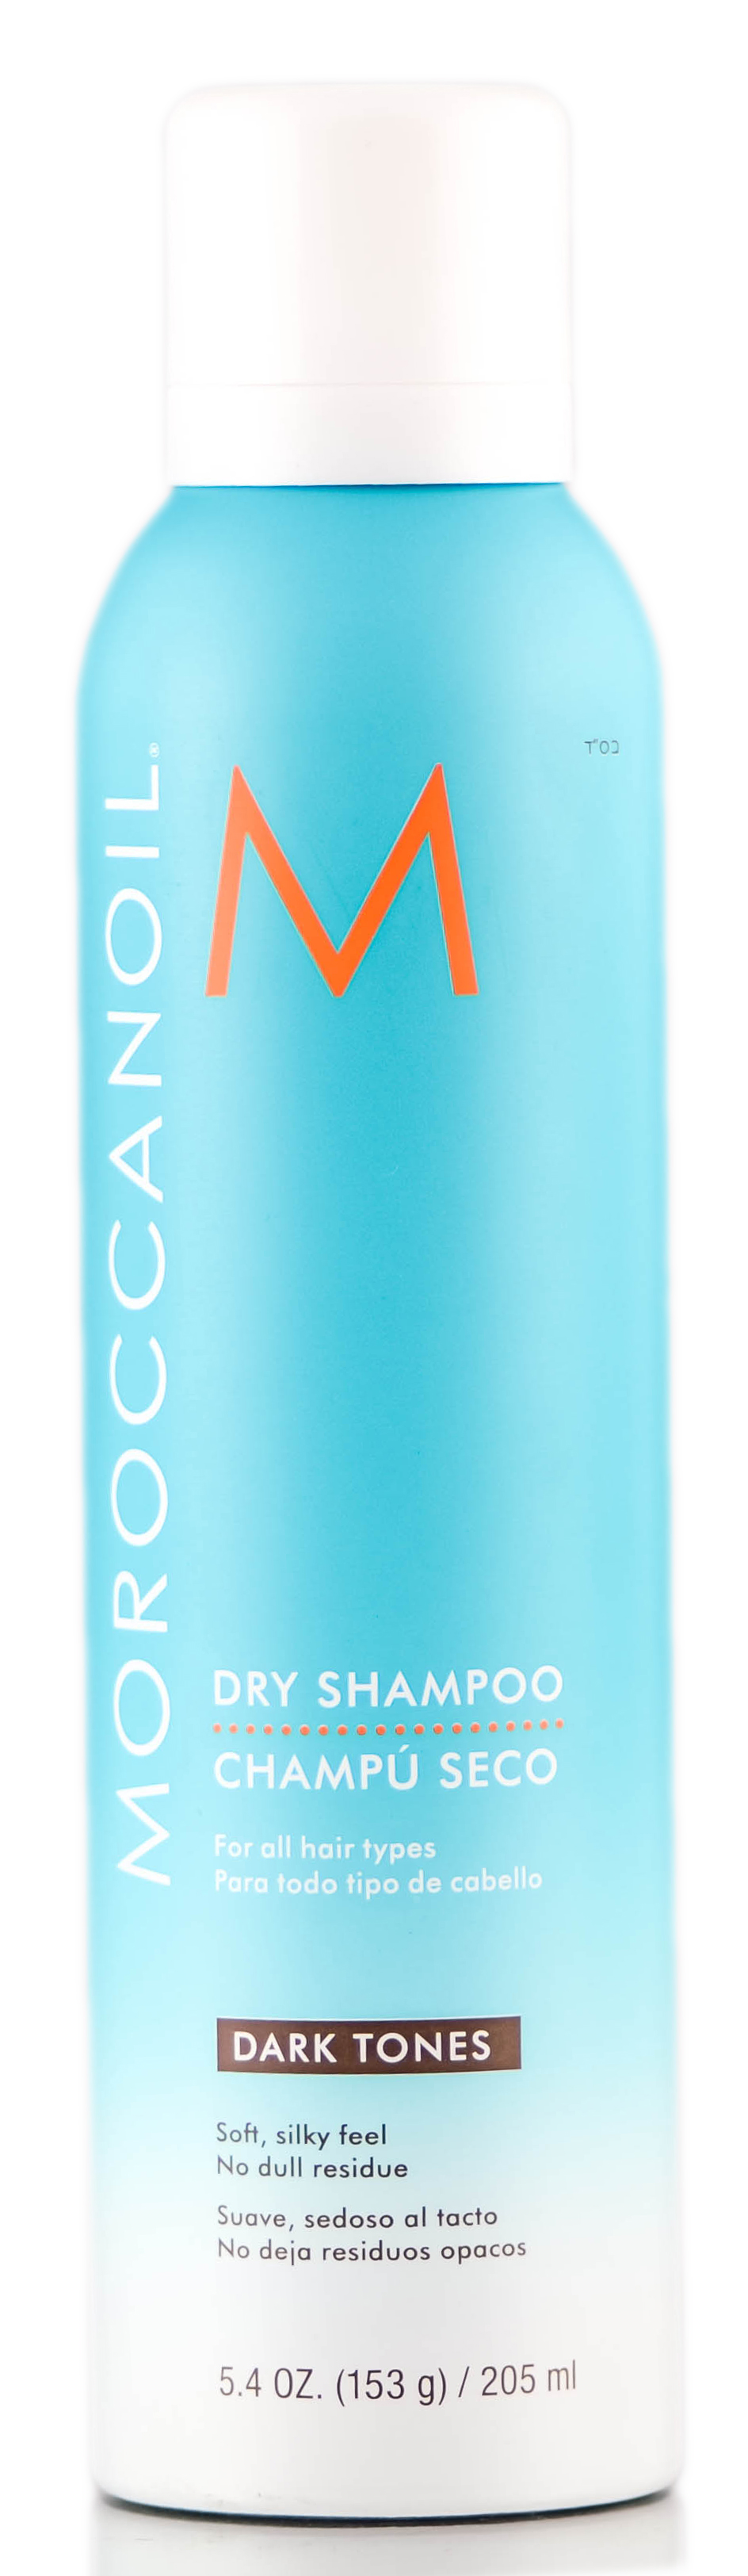 MoroccanOil Dry Shampoo Dark Tones 7290015485951